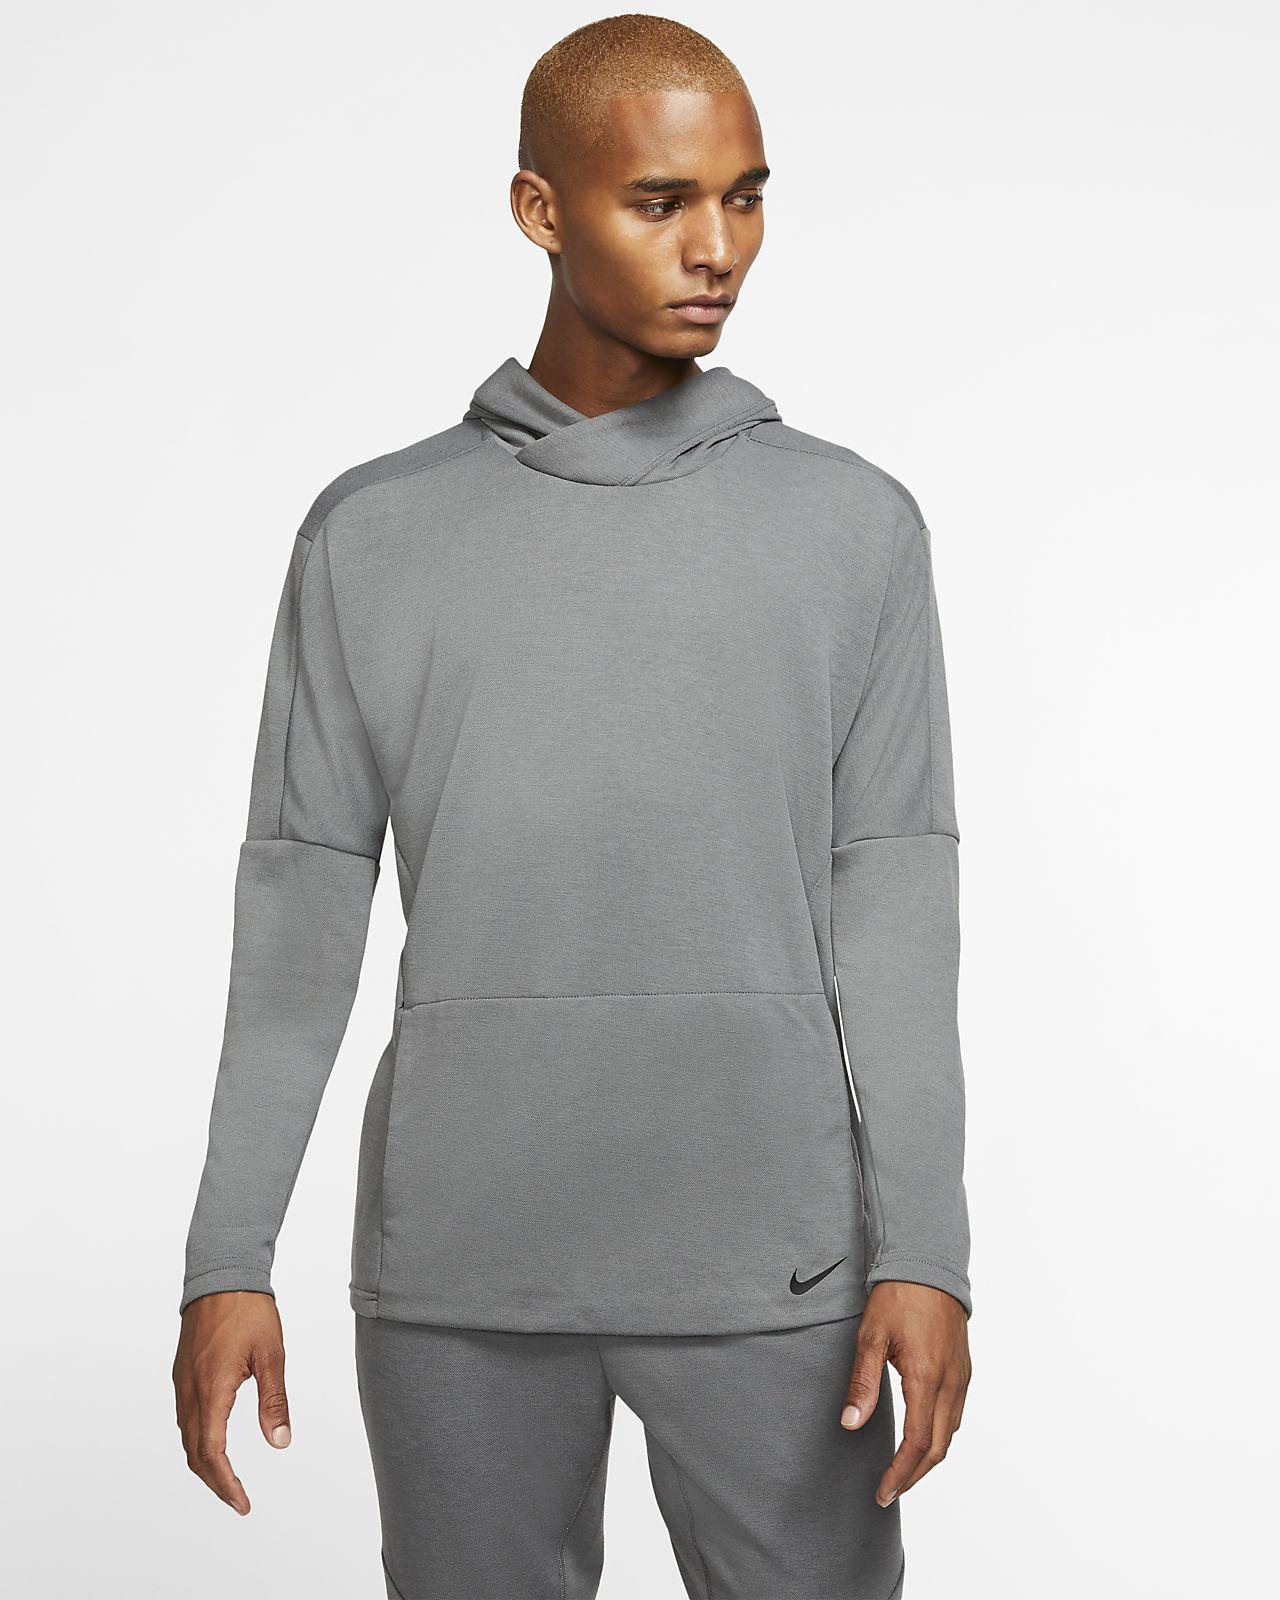 Nike Yoga Dri-FIT kapucnis, belebújós férfipulóver